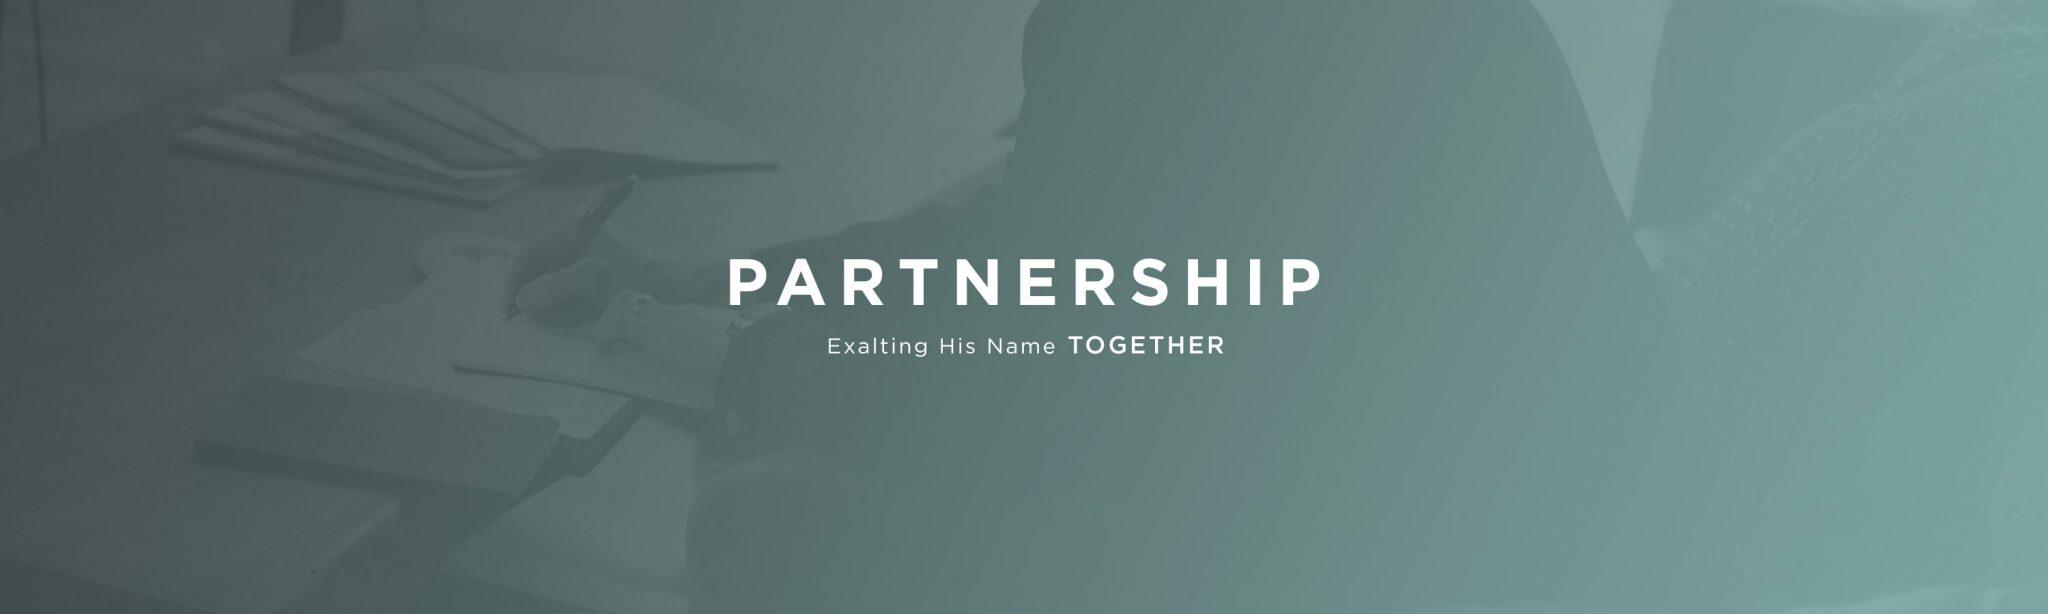 Partnership - Exalting His Name Together